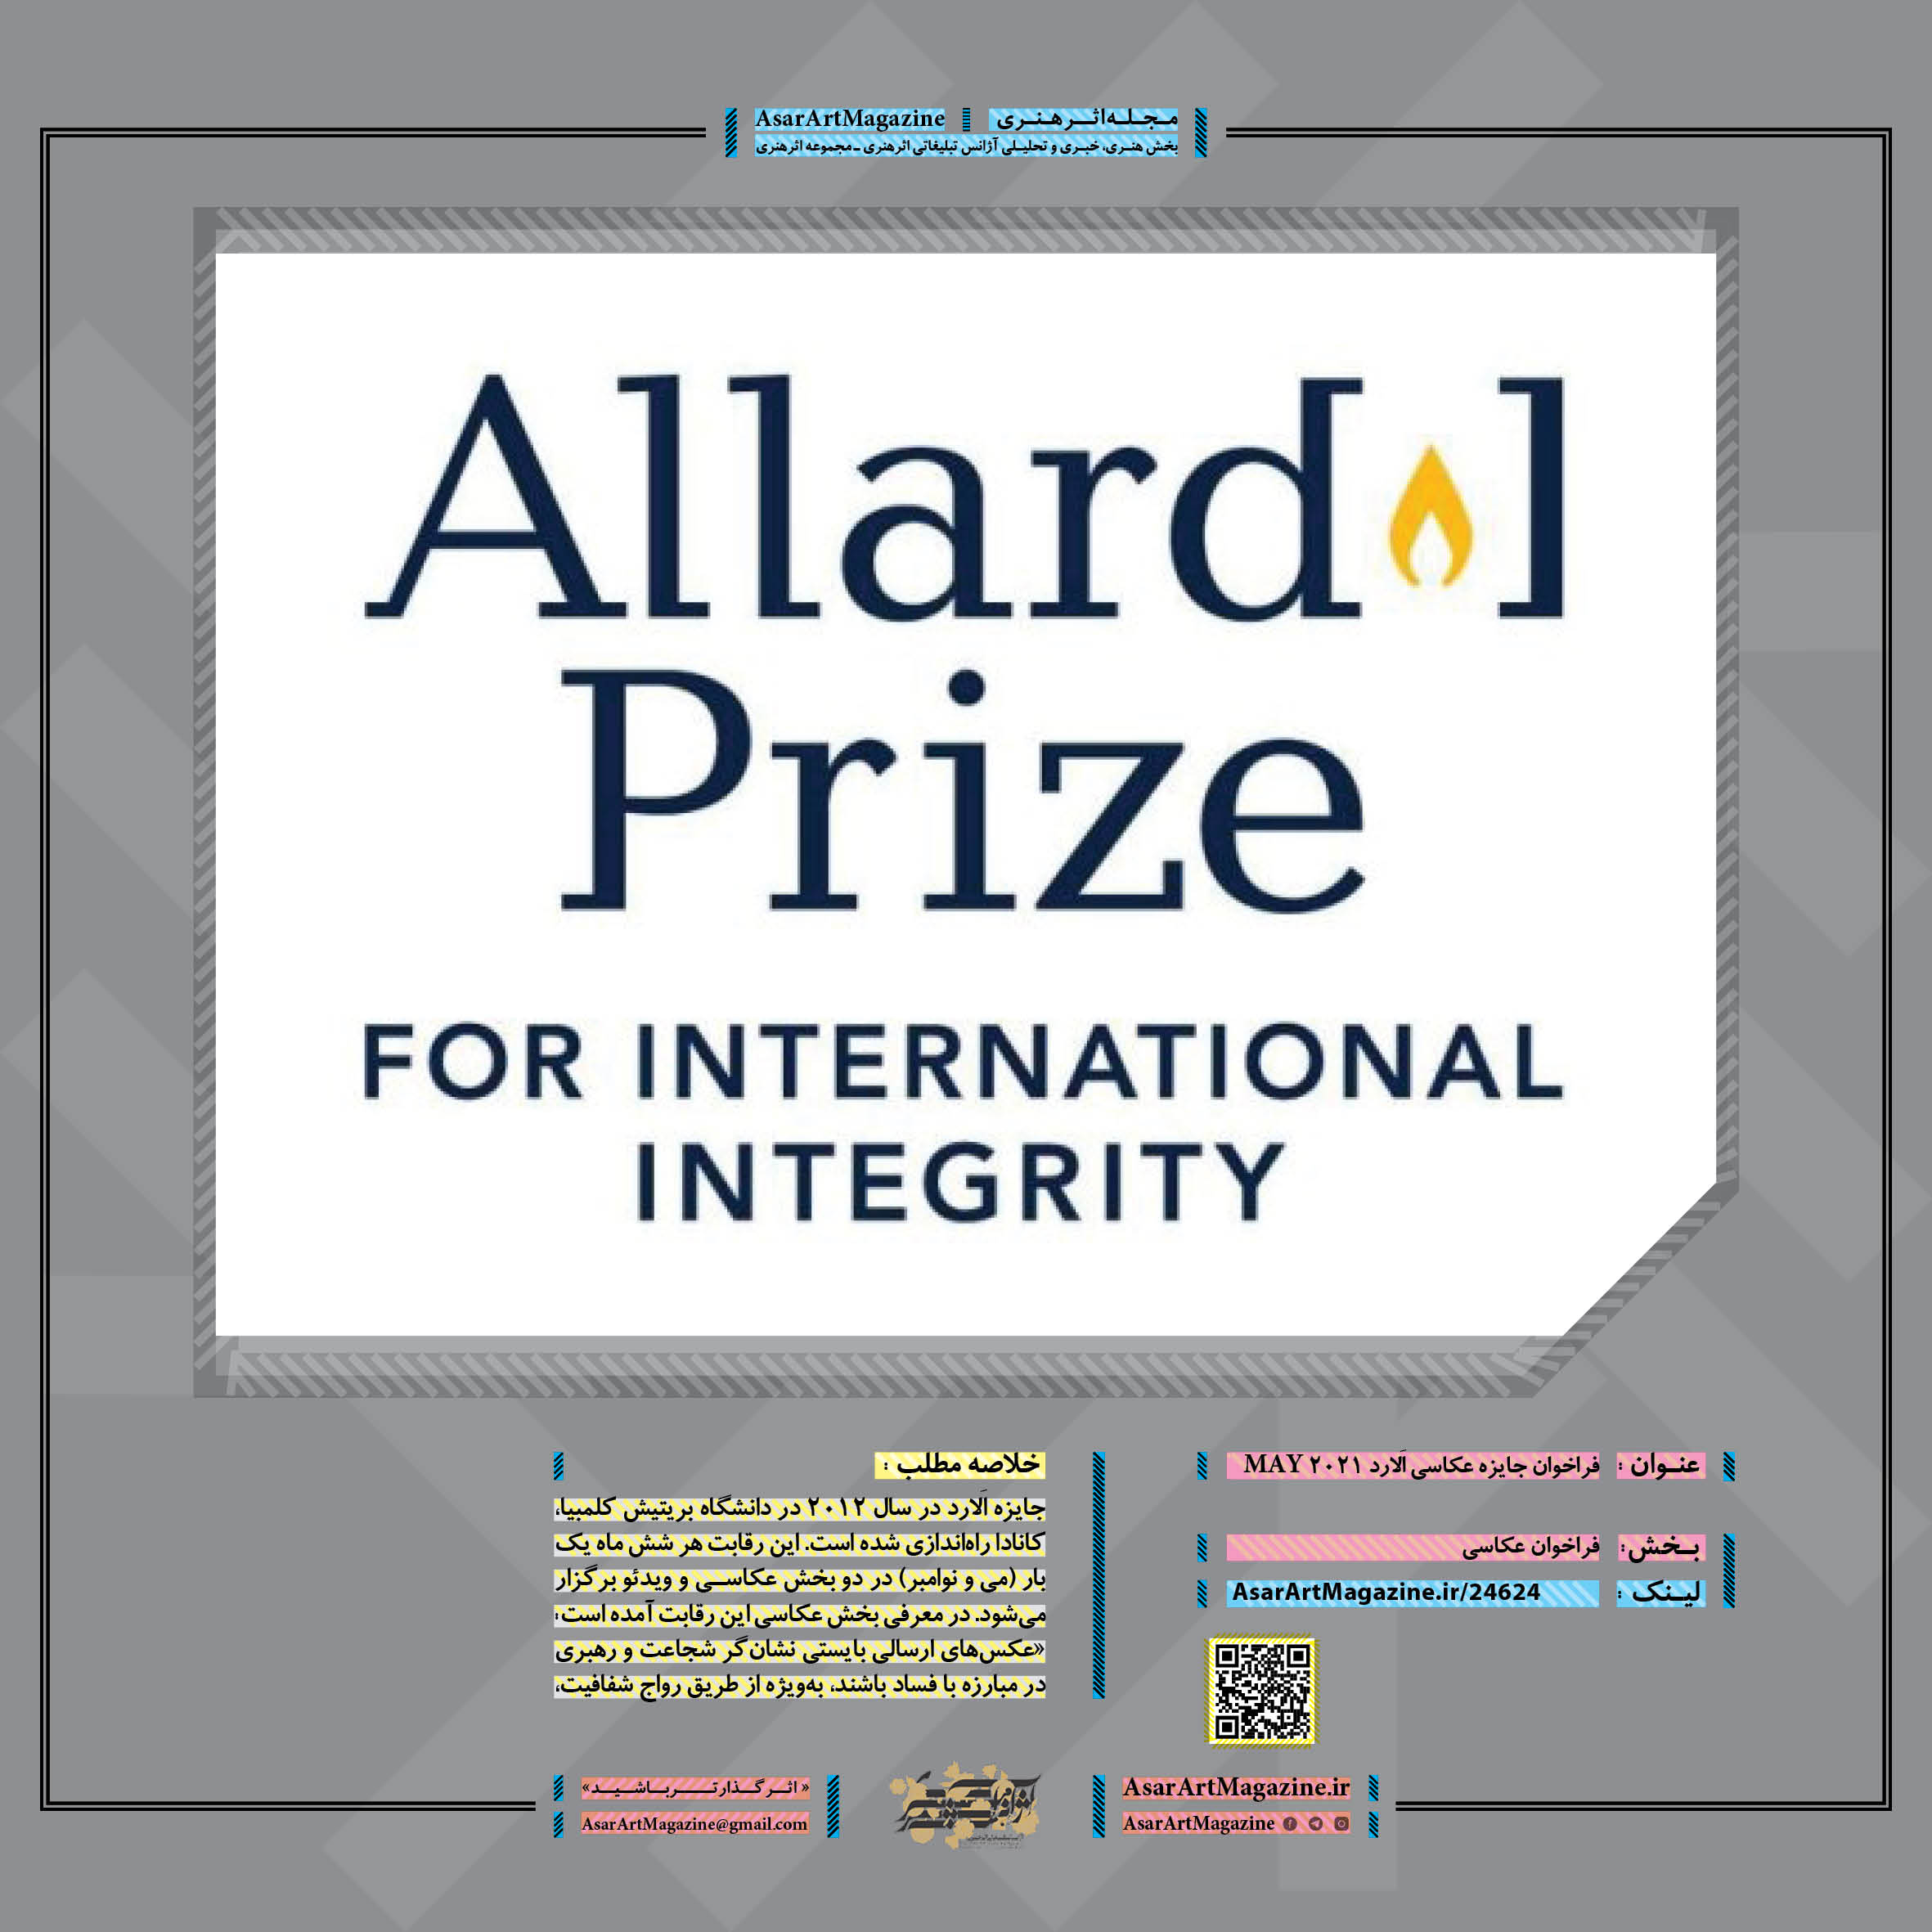 فراخوان جایزه عکاسی اَلارد - Allard Prize لینک : https://asarartmagazine.ir/?p=24624👇 سایت : AsarArtMagazine.ir اینستاگرام : instagram.com/AsarArtMagazine تلگرام :  t.me/AsarArtMagazine 👆